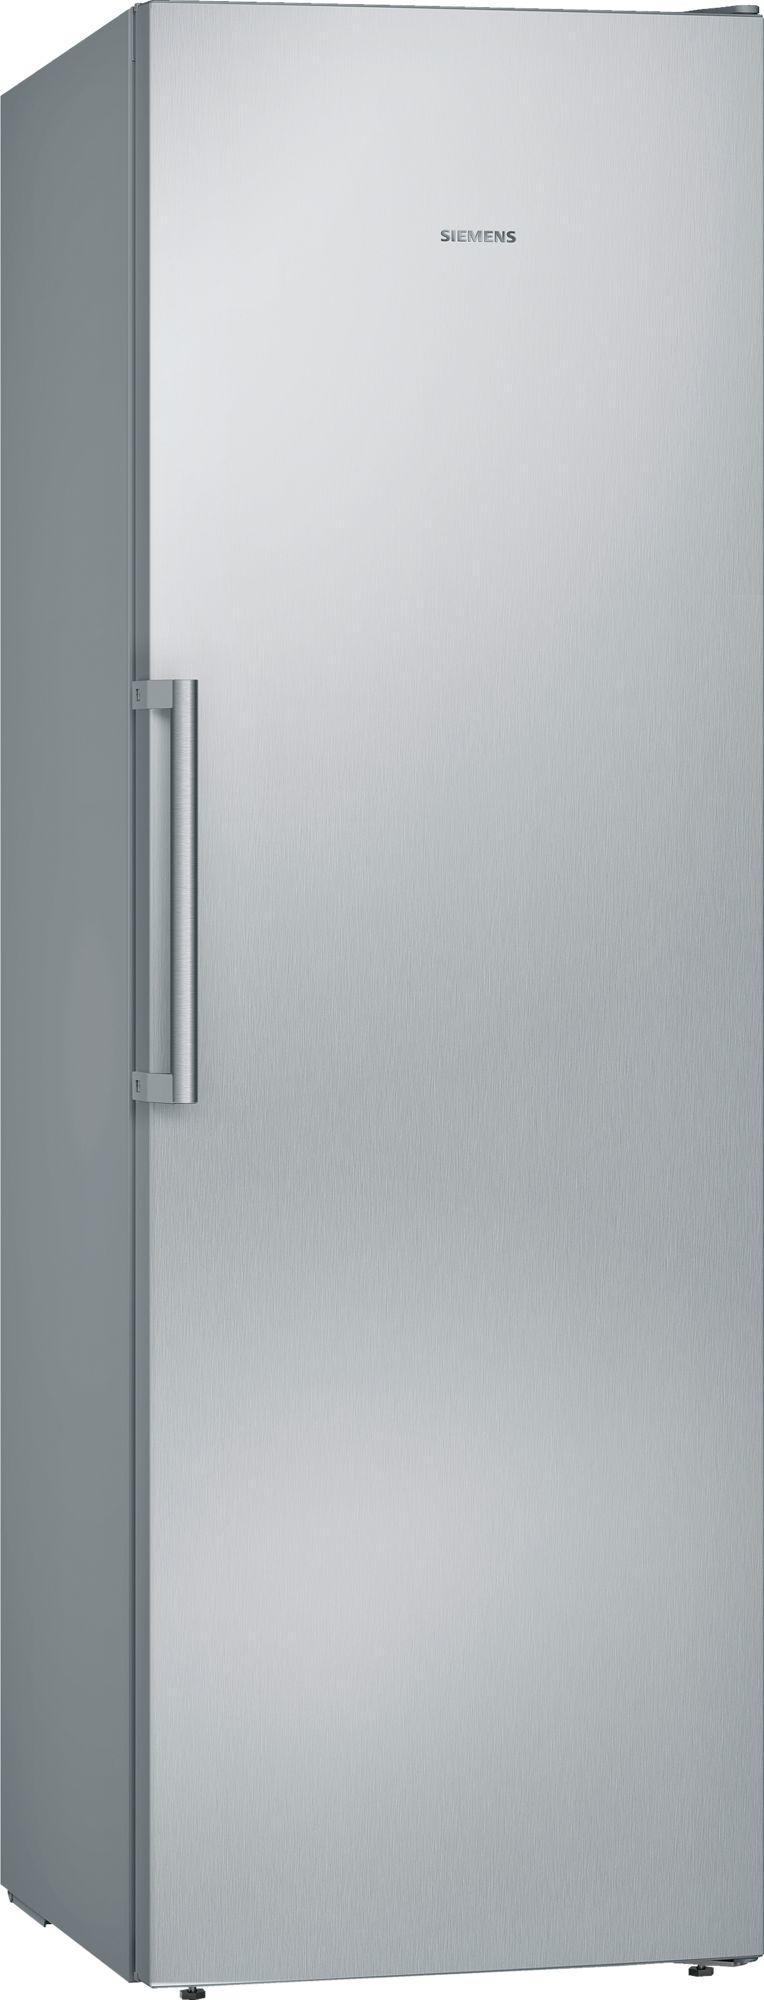 Image of iQ300 GS36NVIFV 242 Litre 60cm Single Door Freezer | Silver Innox